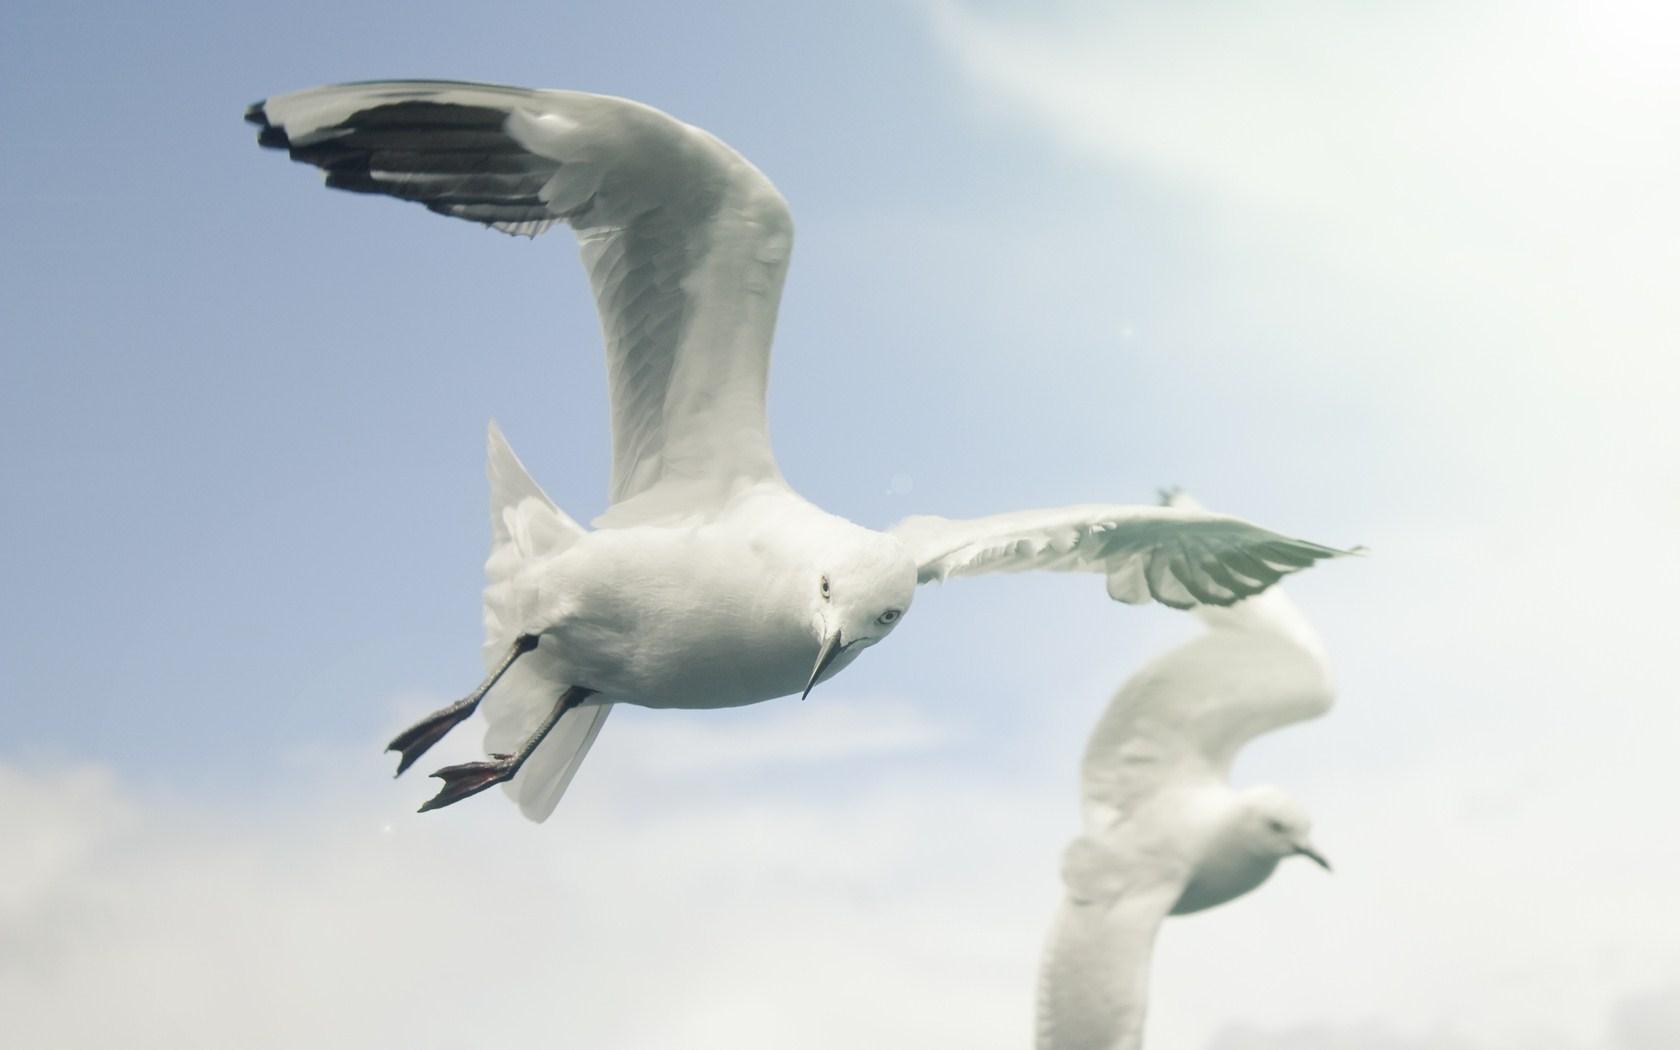 Birds White Seagulls Sky